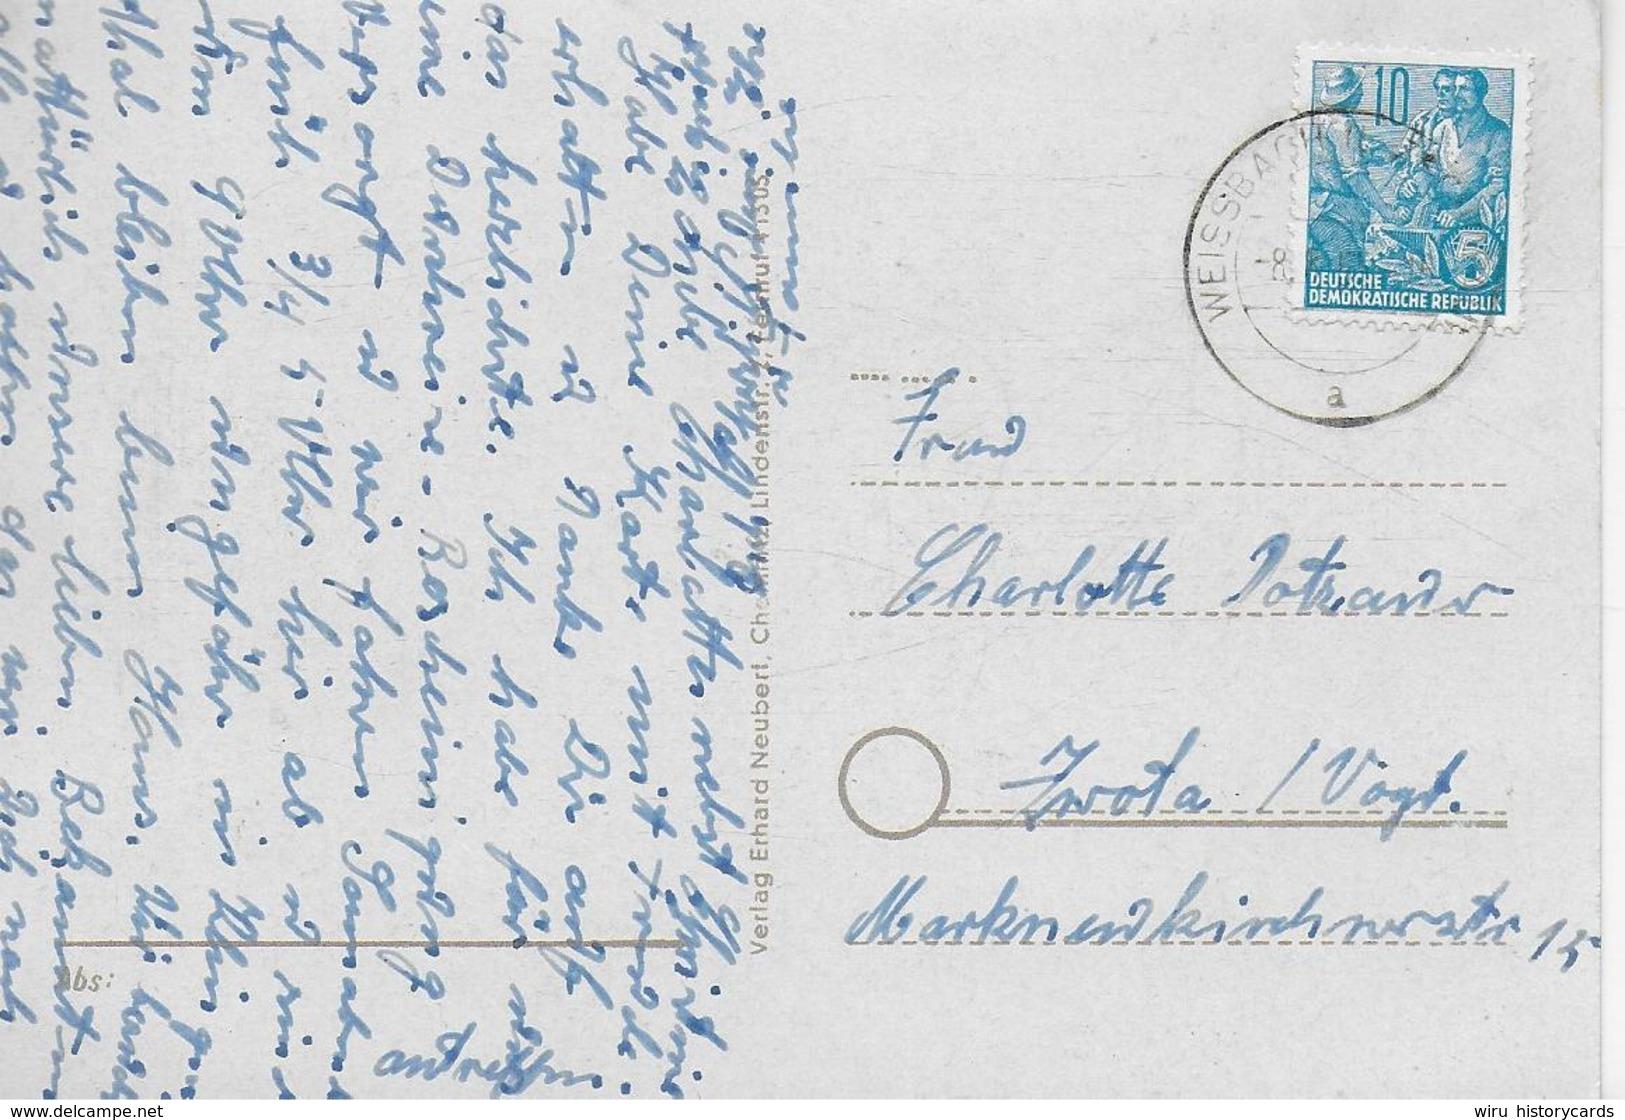 AK 0324  Weißbach Bei Zschopau / Ostalgie , DDR Um 1954 - Zschopau